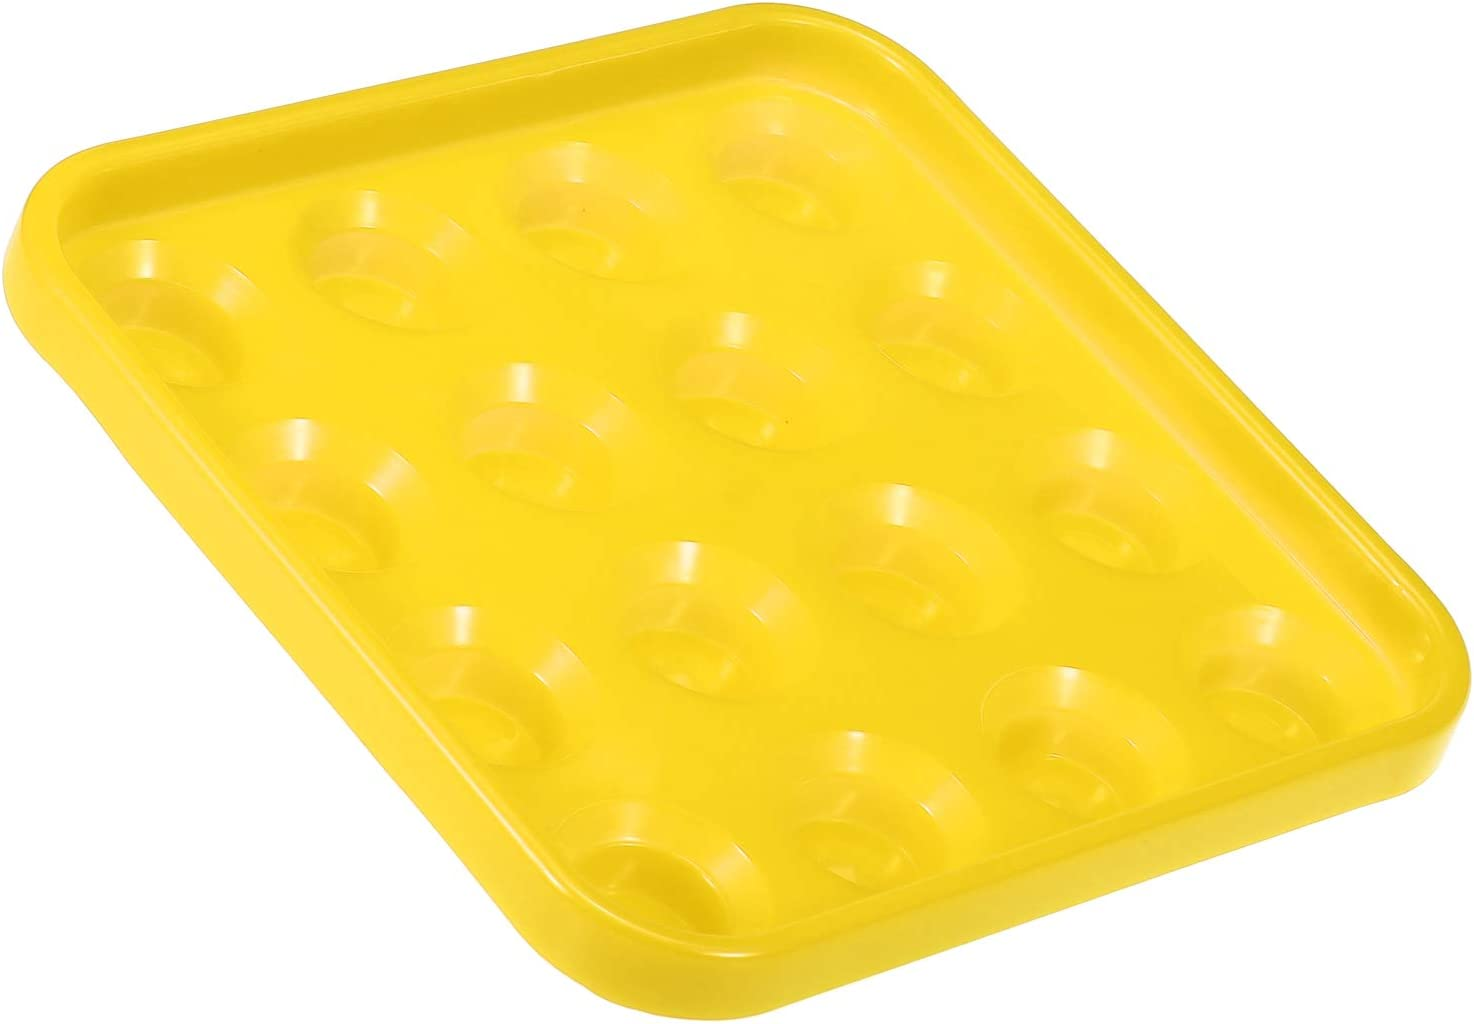 Standard Cue Ball Tray Ultralight Plastic Billiard Ball Storage Case for 16//22 Balls Explopur Cue Ball Tray